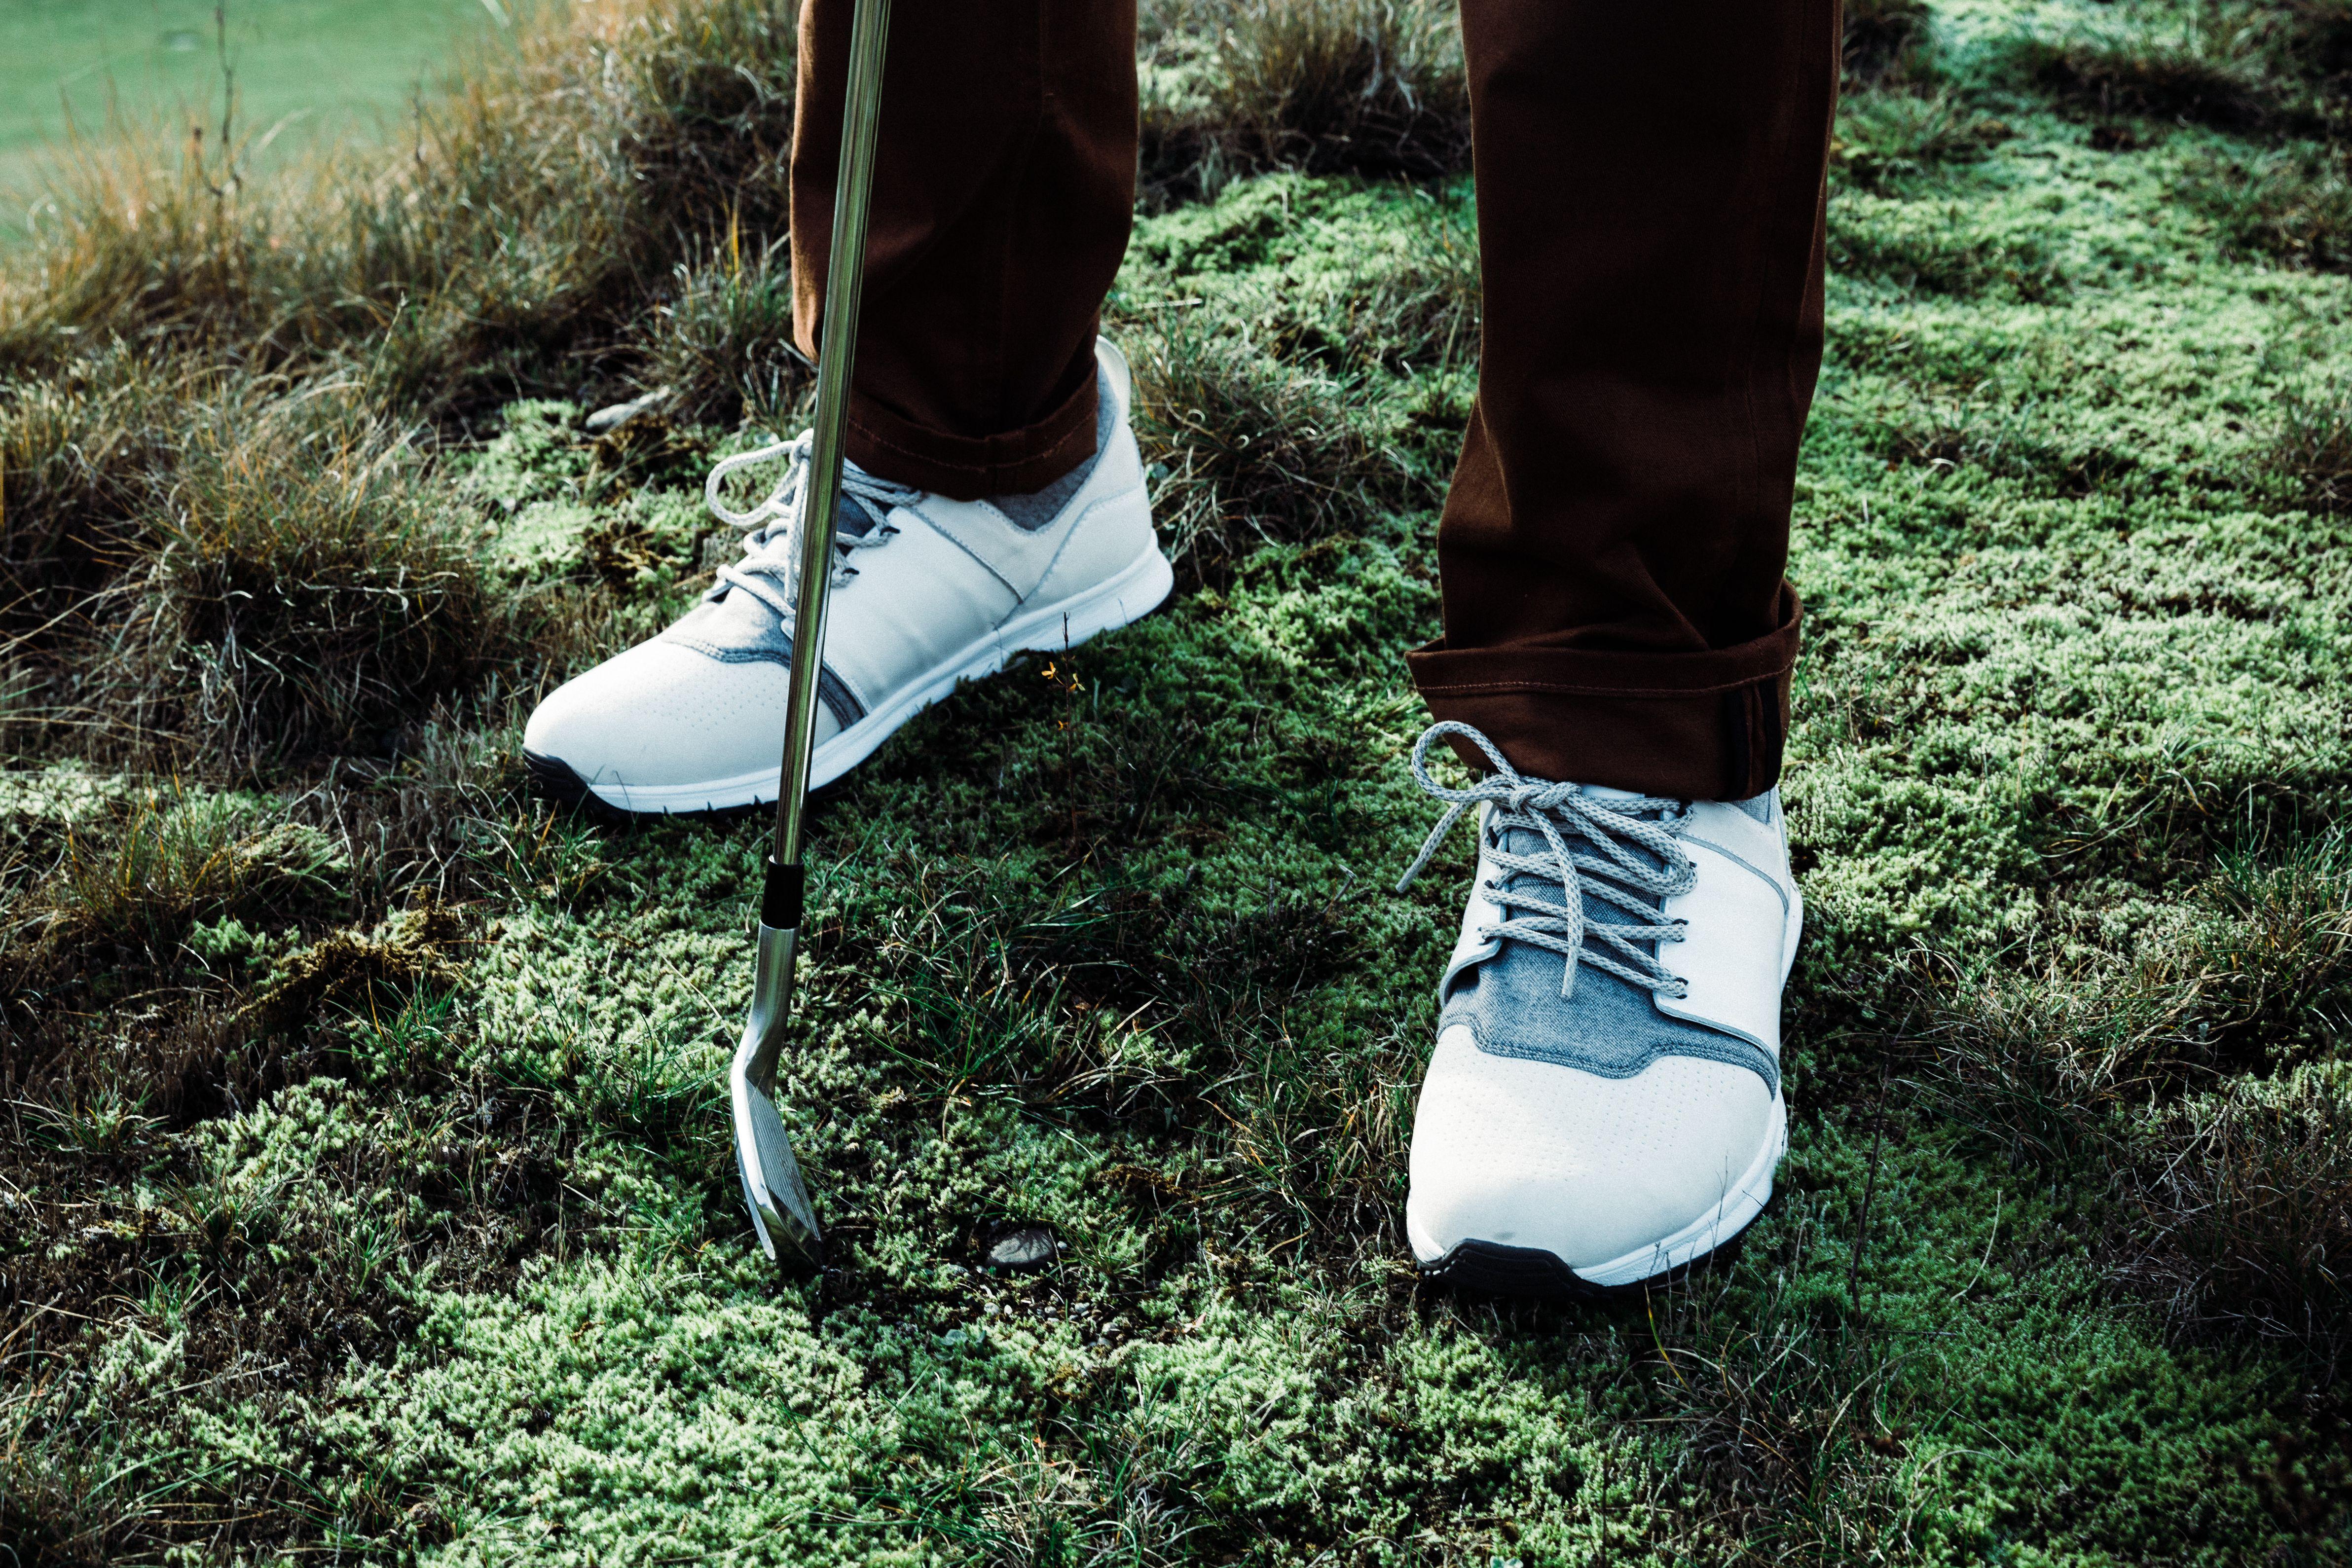 TRUE Major   White   Spikeless golf